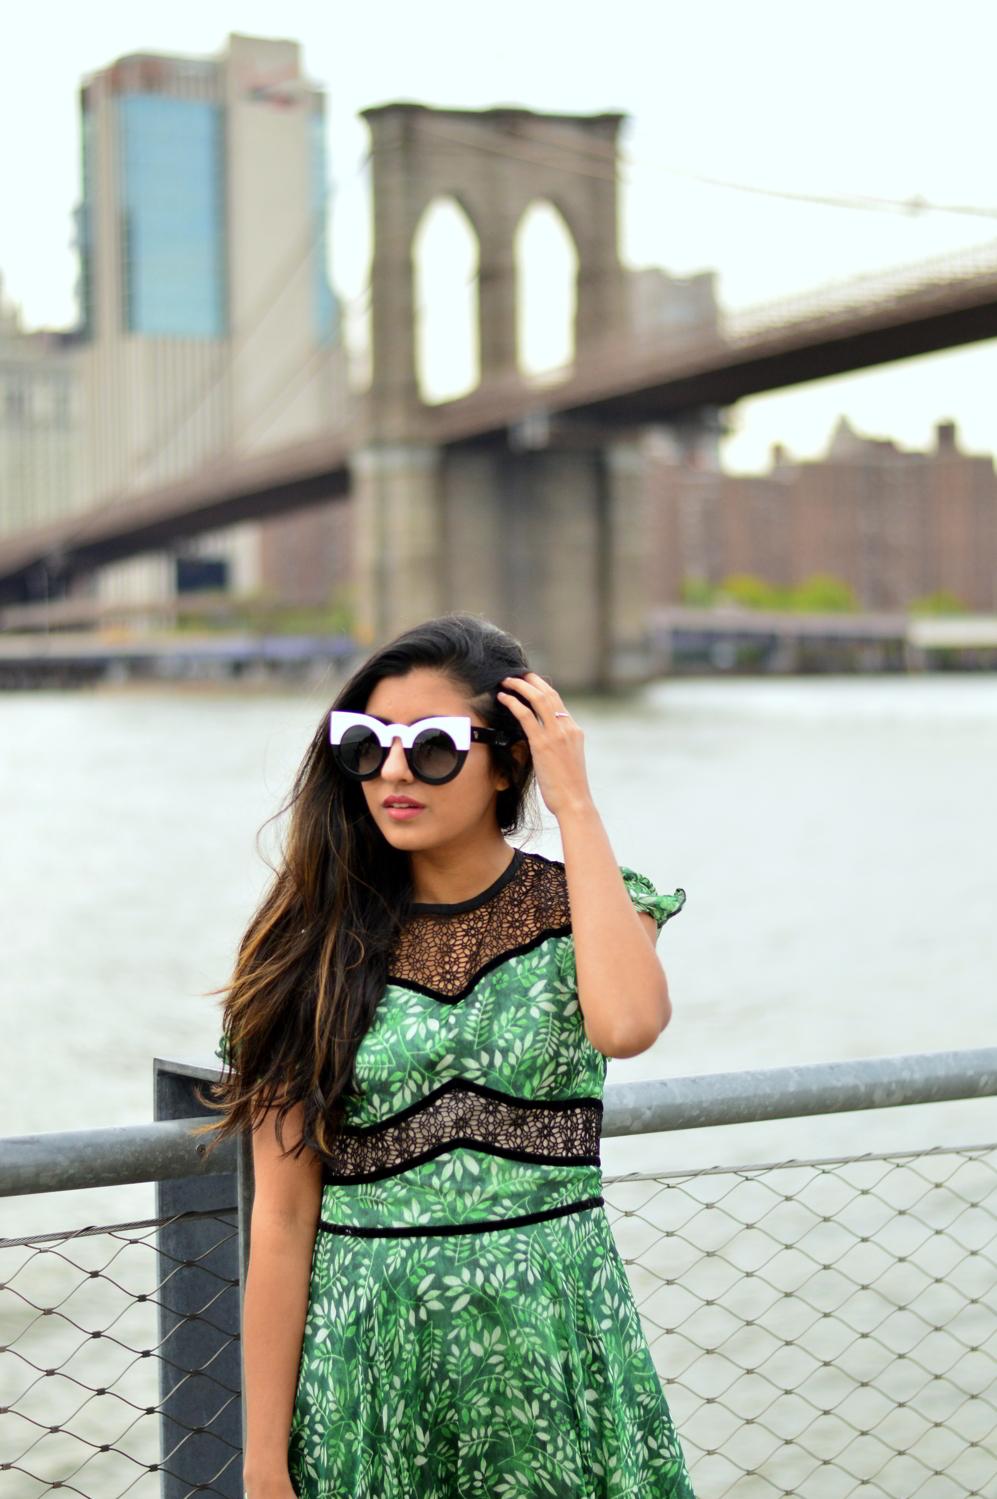 green-leaf-print-summer-sundress-brooklyn-bridge-nyc-blogger-outfit 6